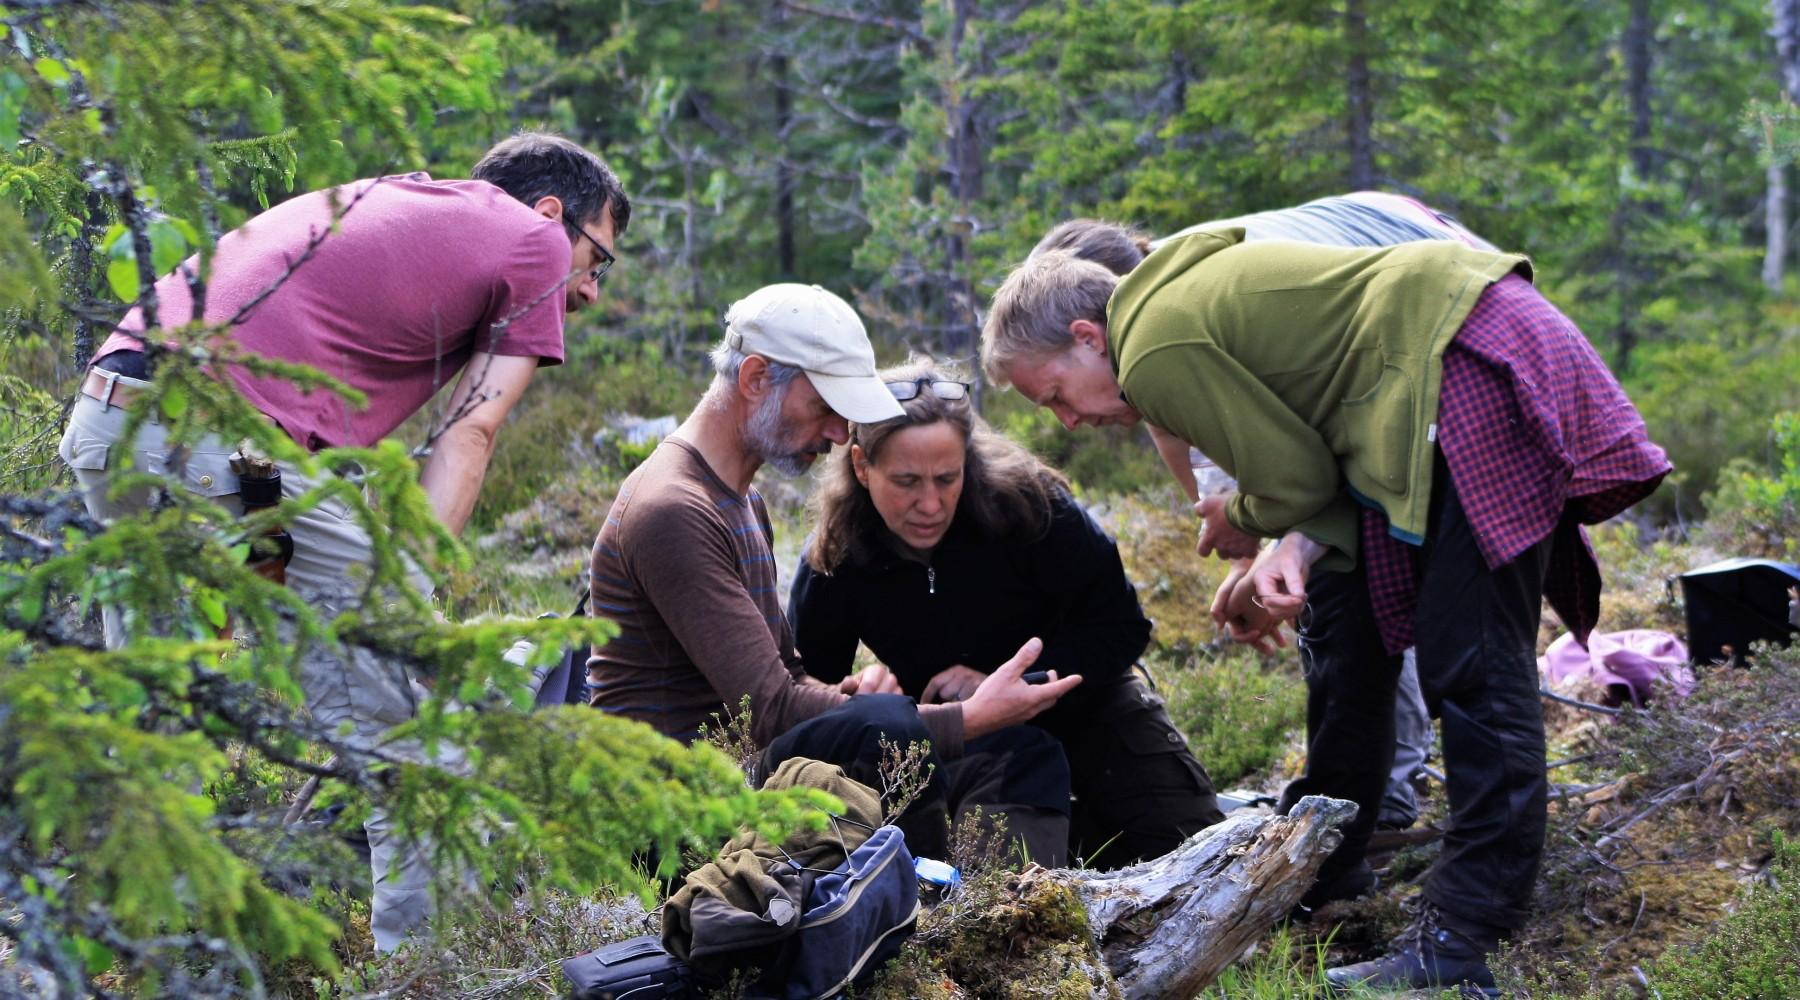 Naturkunde Exkursion: Braunbären